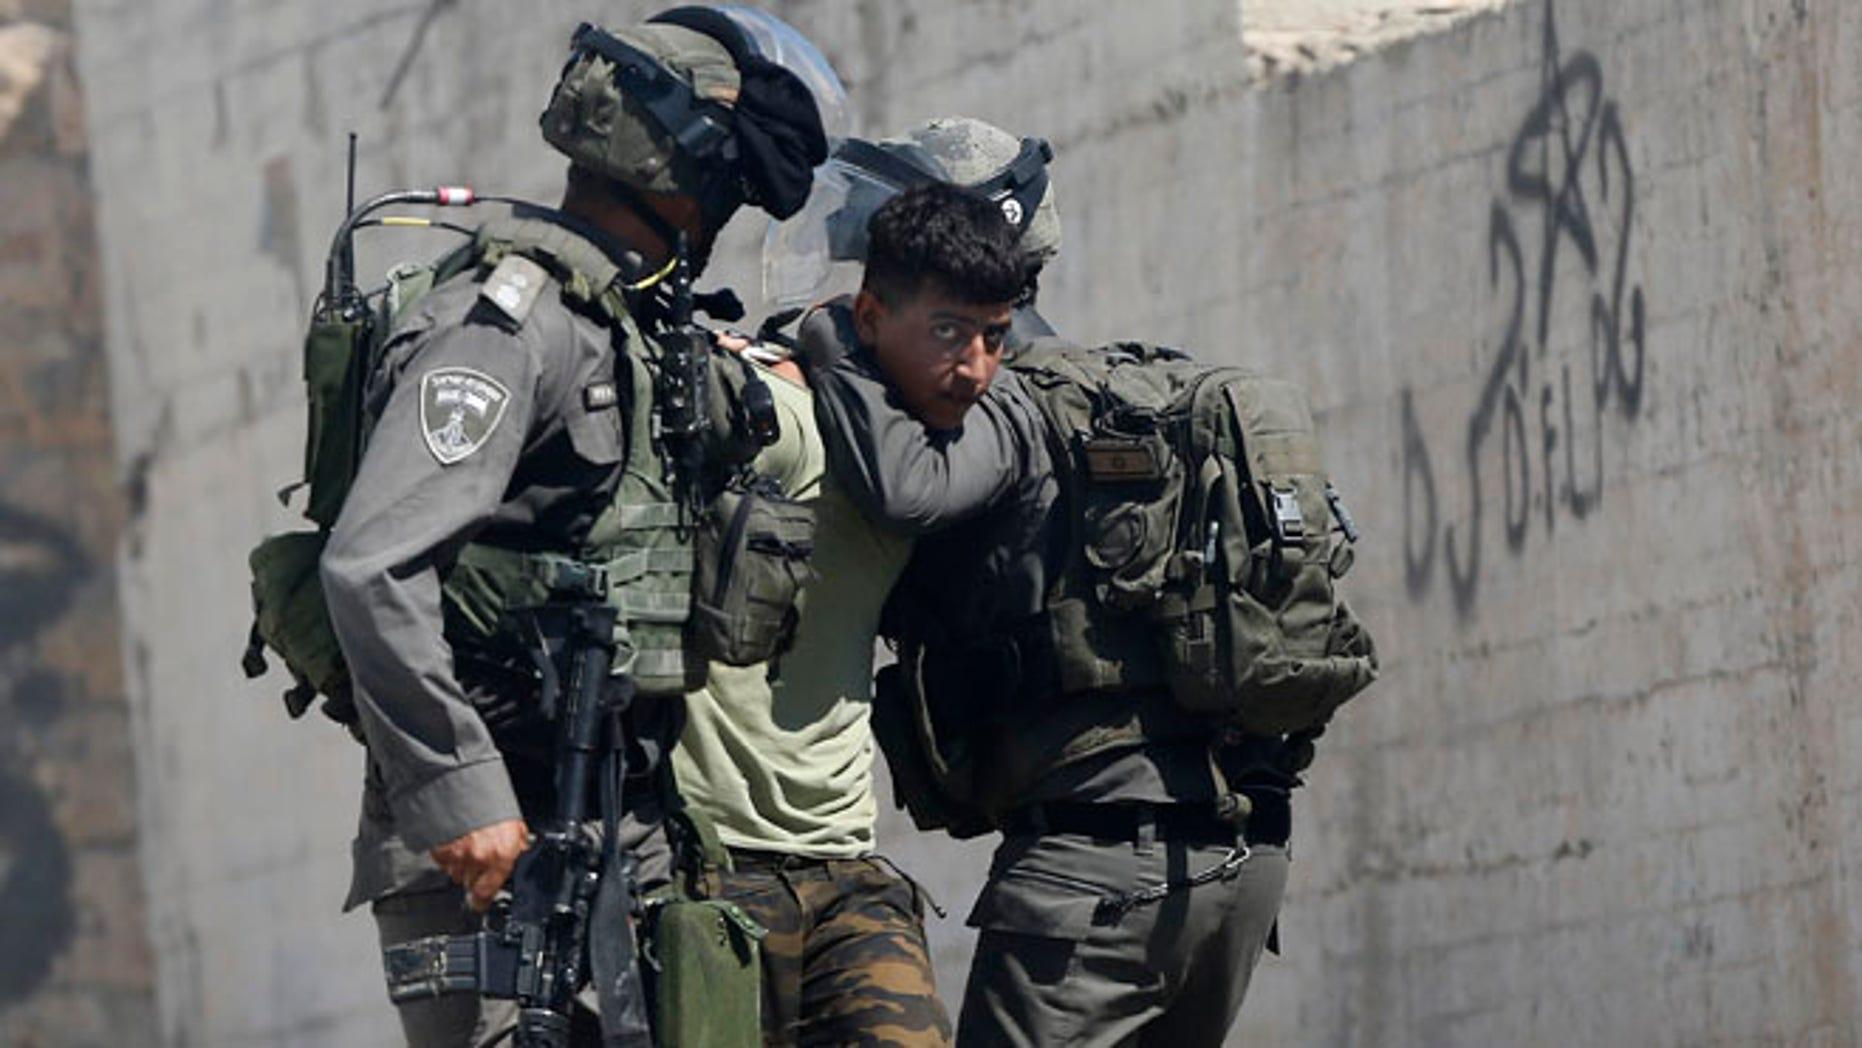 Israeli border police arrest a Palestinian during clashes in the West Bank village of Deir Abu Mash'al near Ramallah, Saturday.